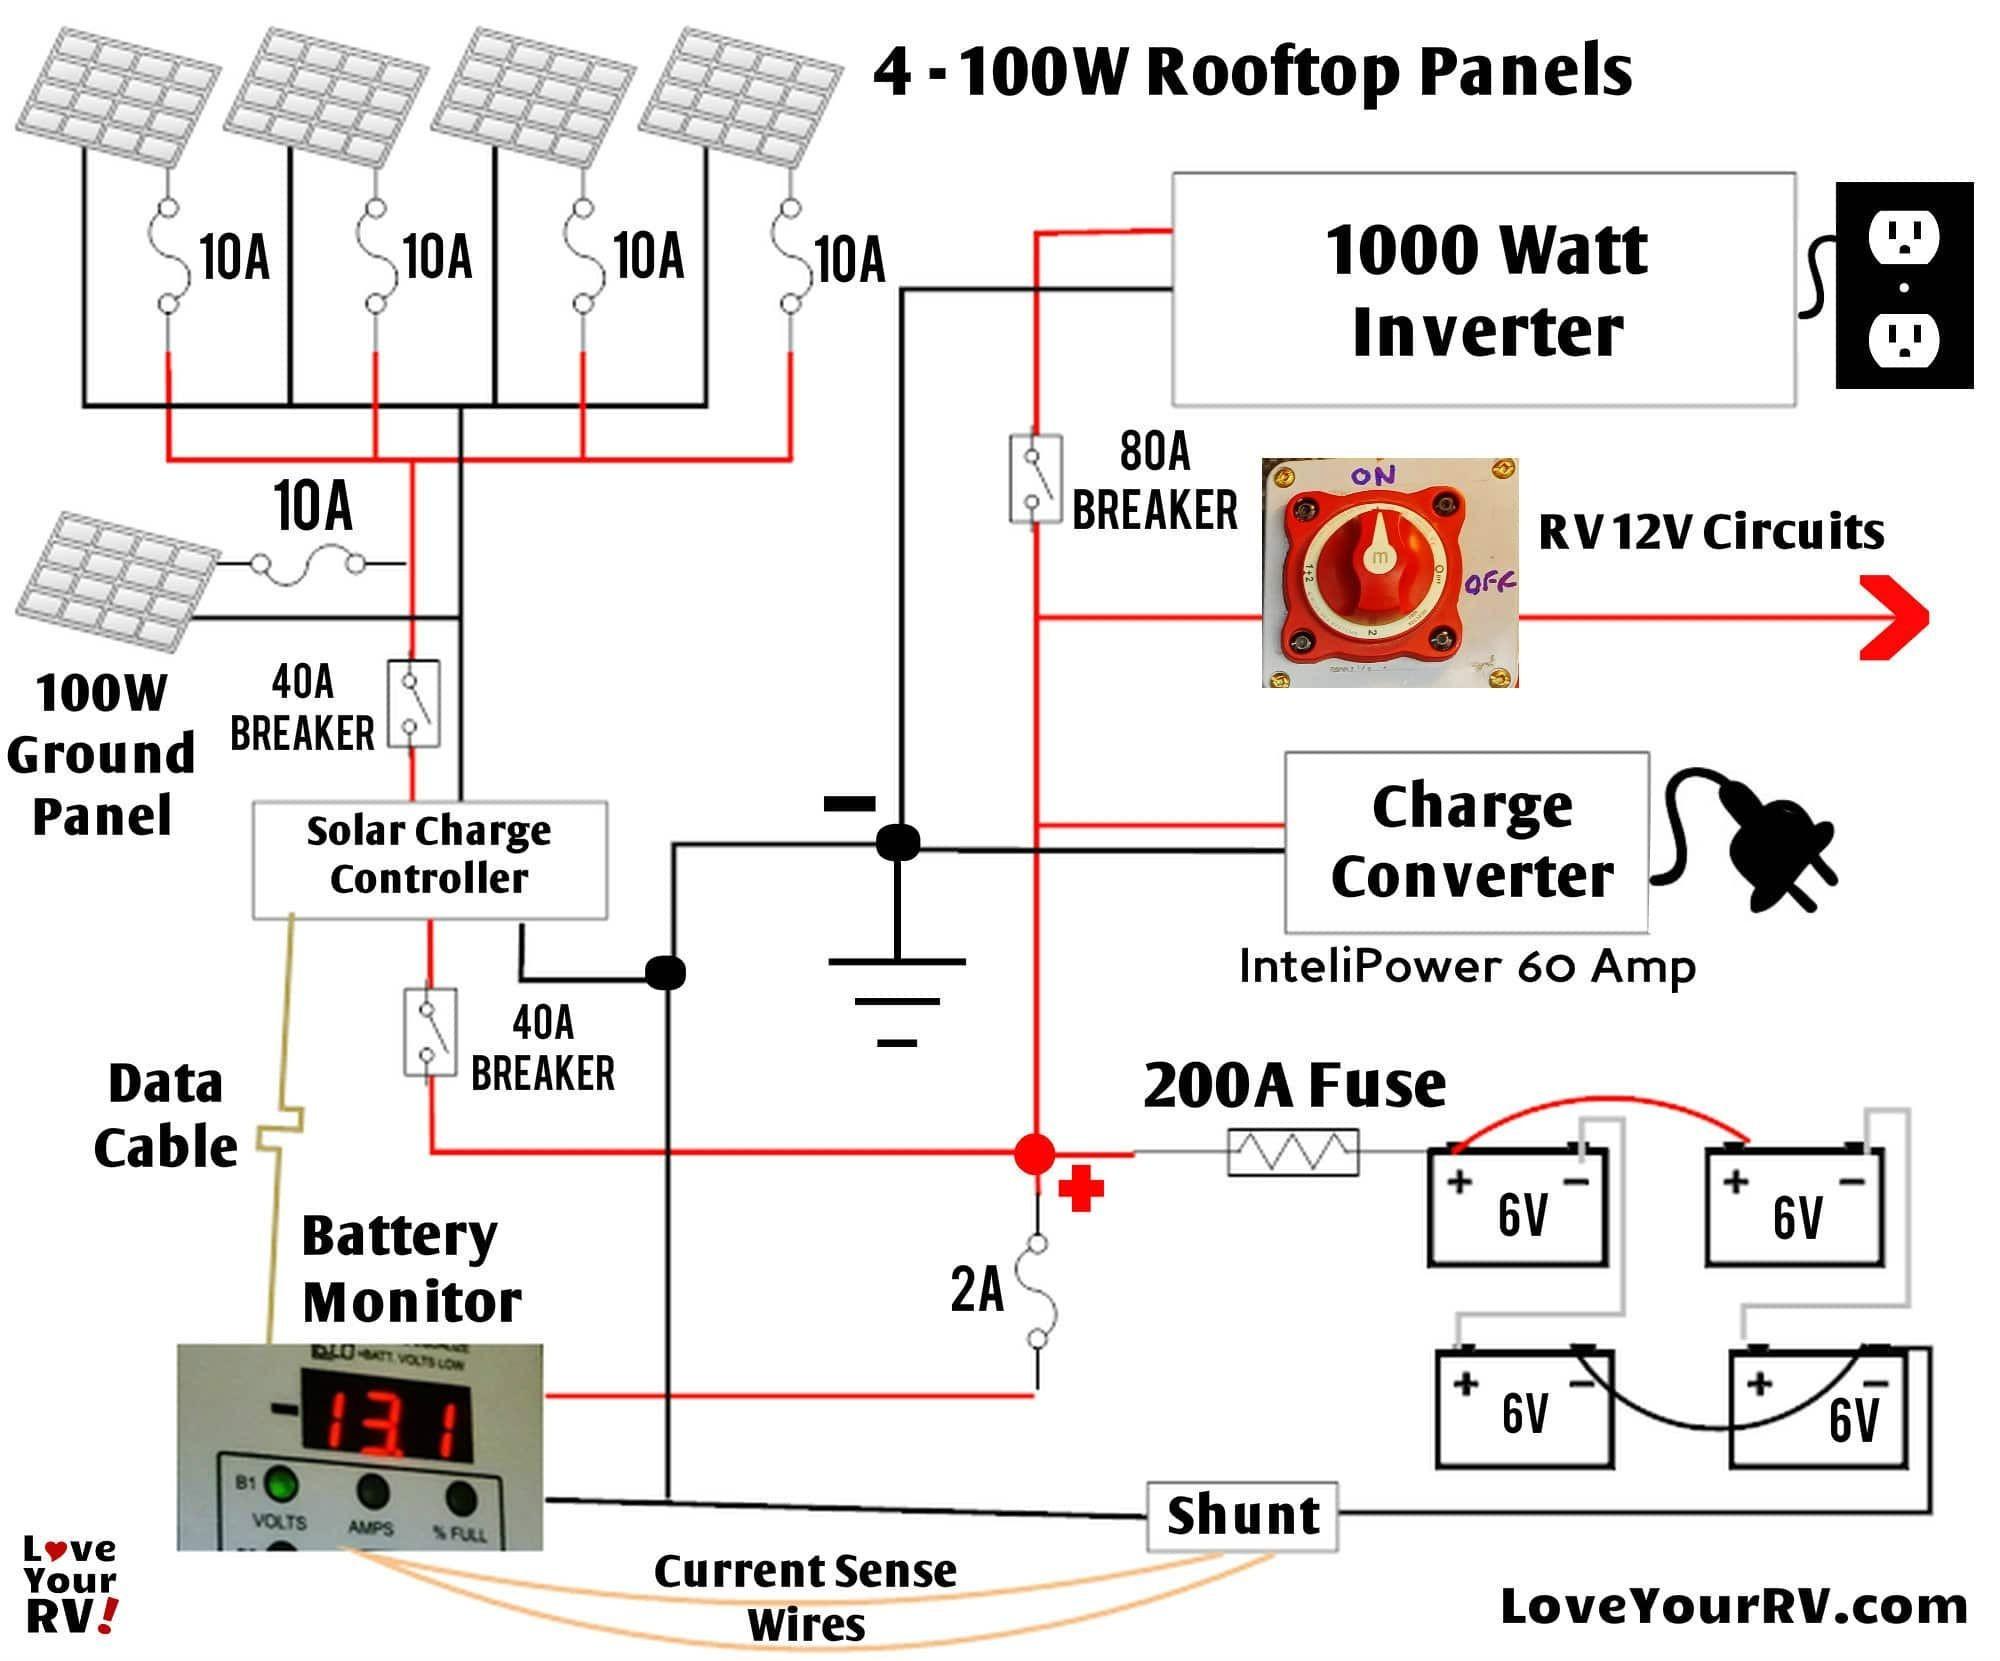 Cargo Trailer Wiring Diagram Detailed Look at Our Diy Rv Boondocking Power System Of Cargo Trailer Wiring Diagram